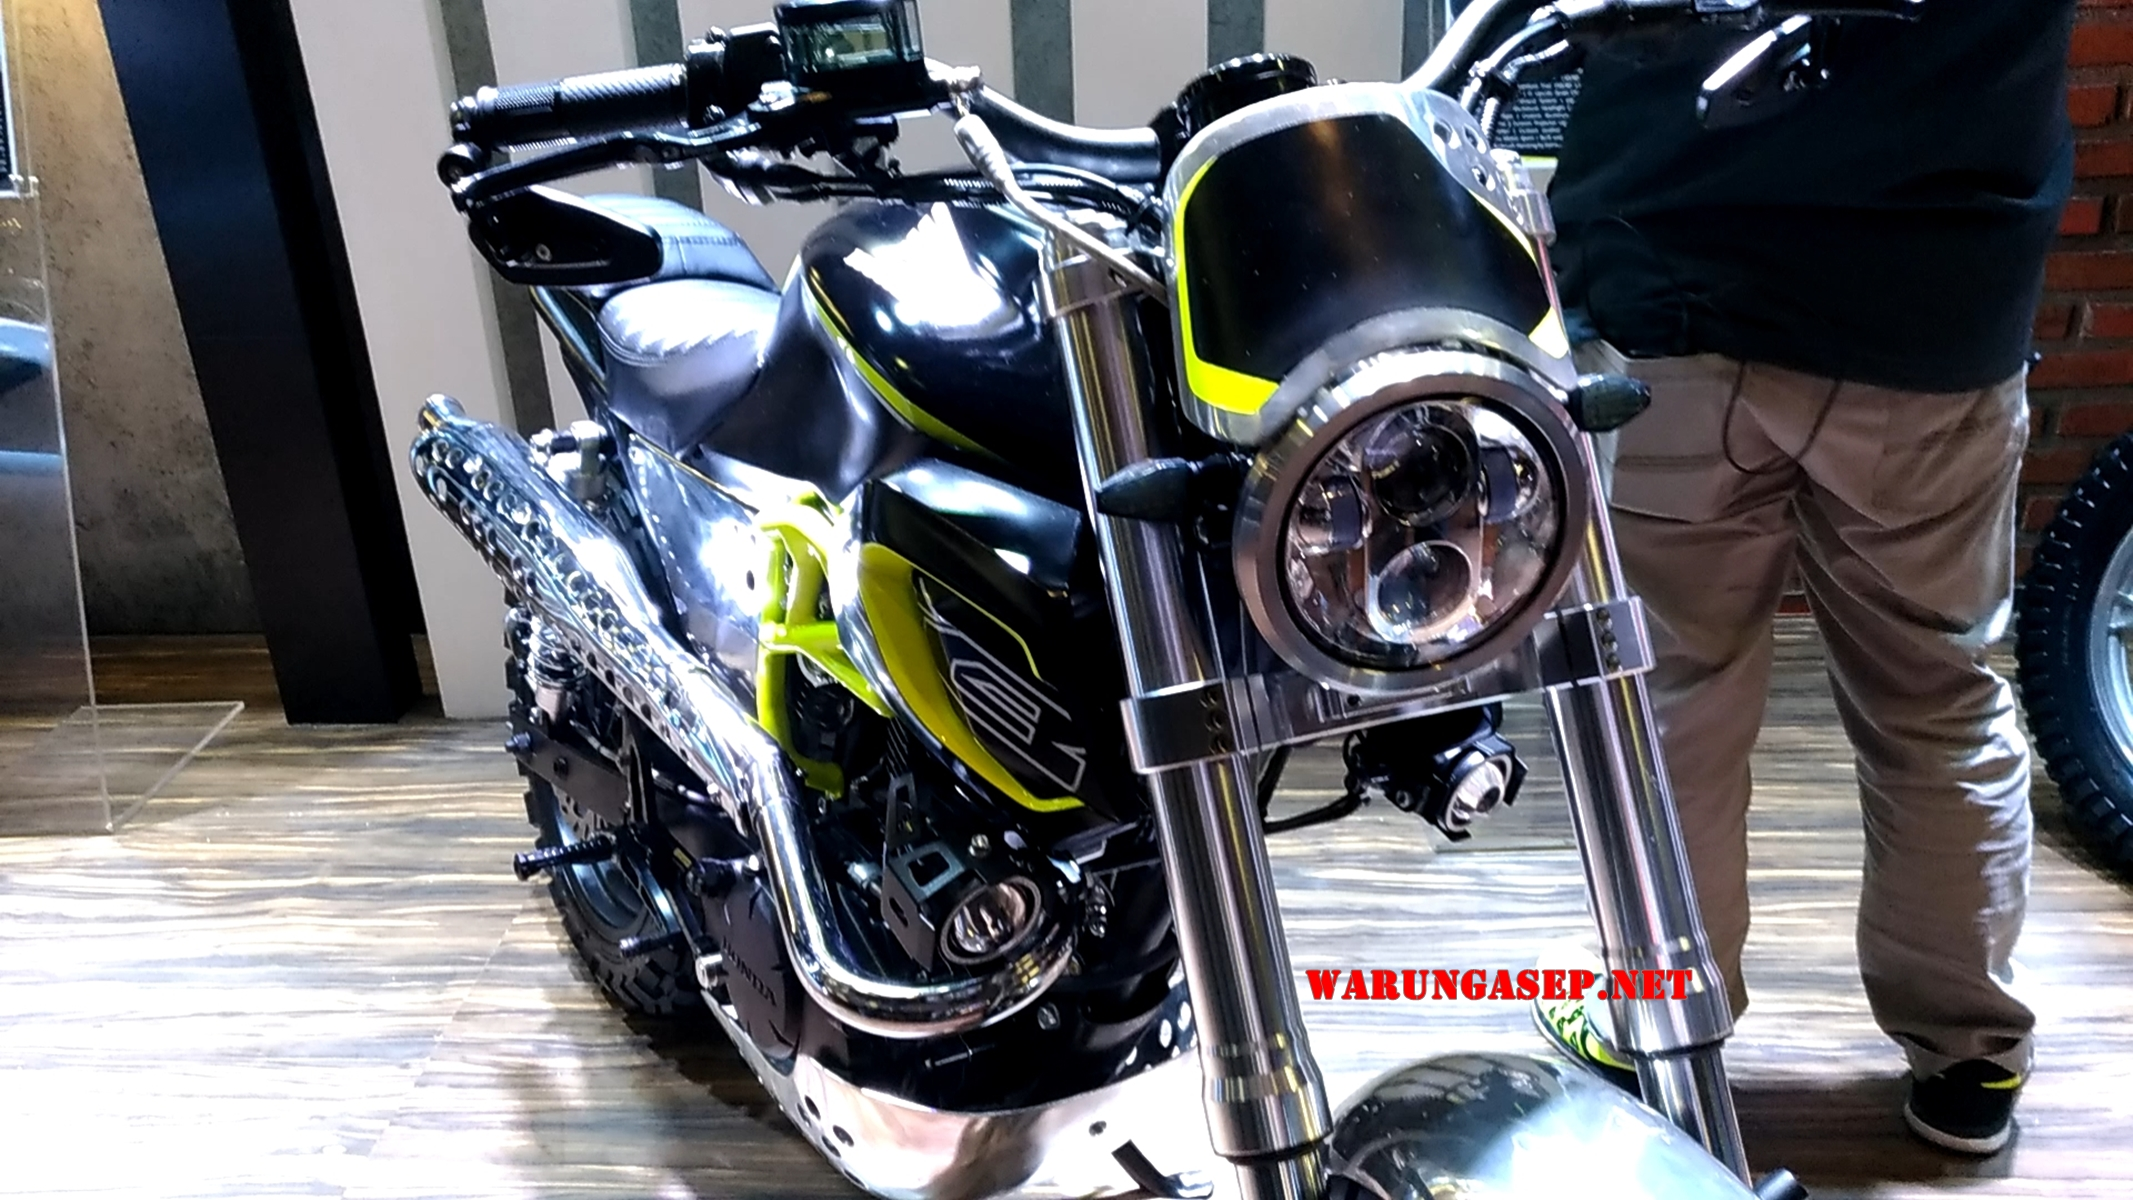 Modifikasi Honda CB150 Verza Bergaya Scrambler WARUNGASEP